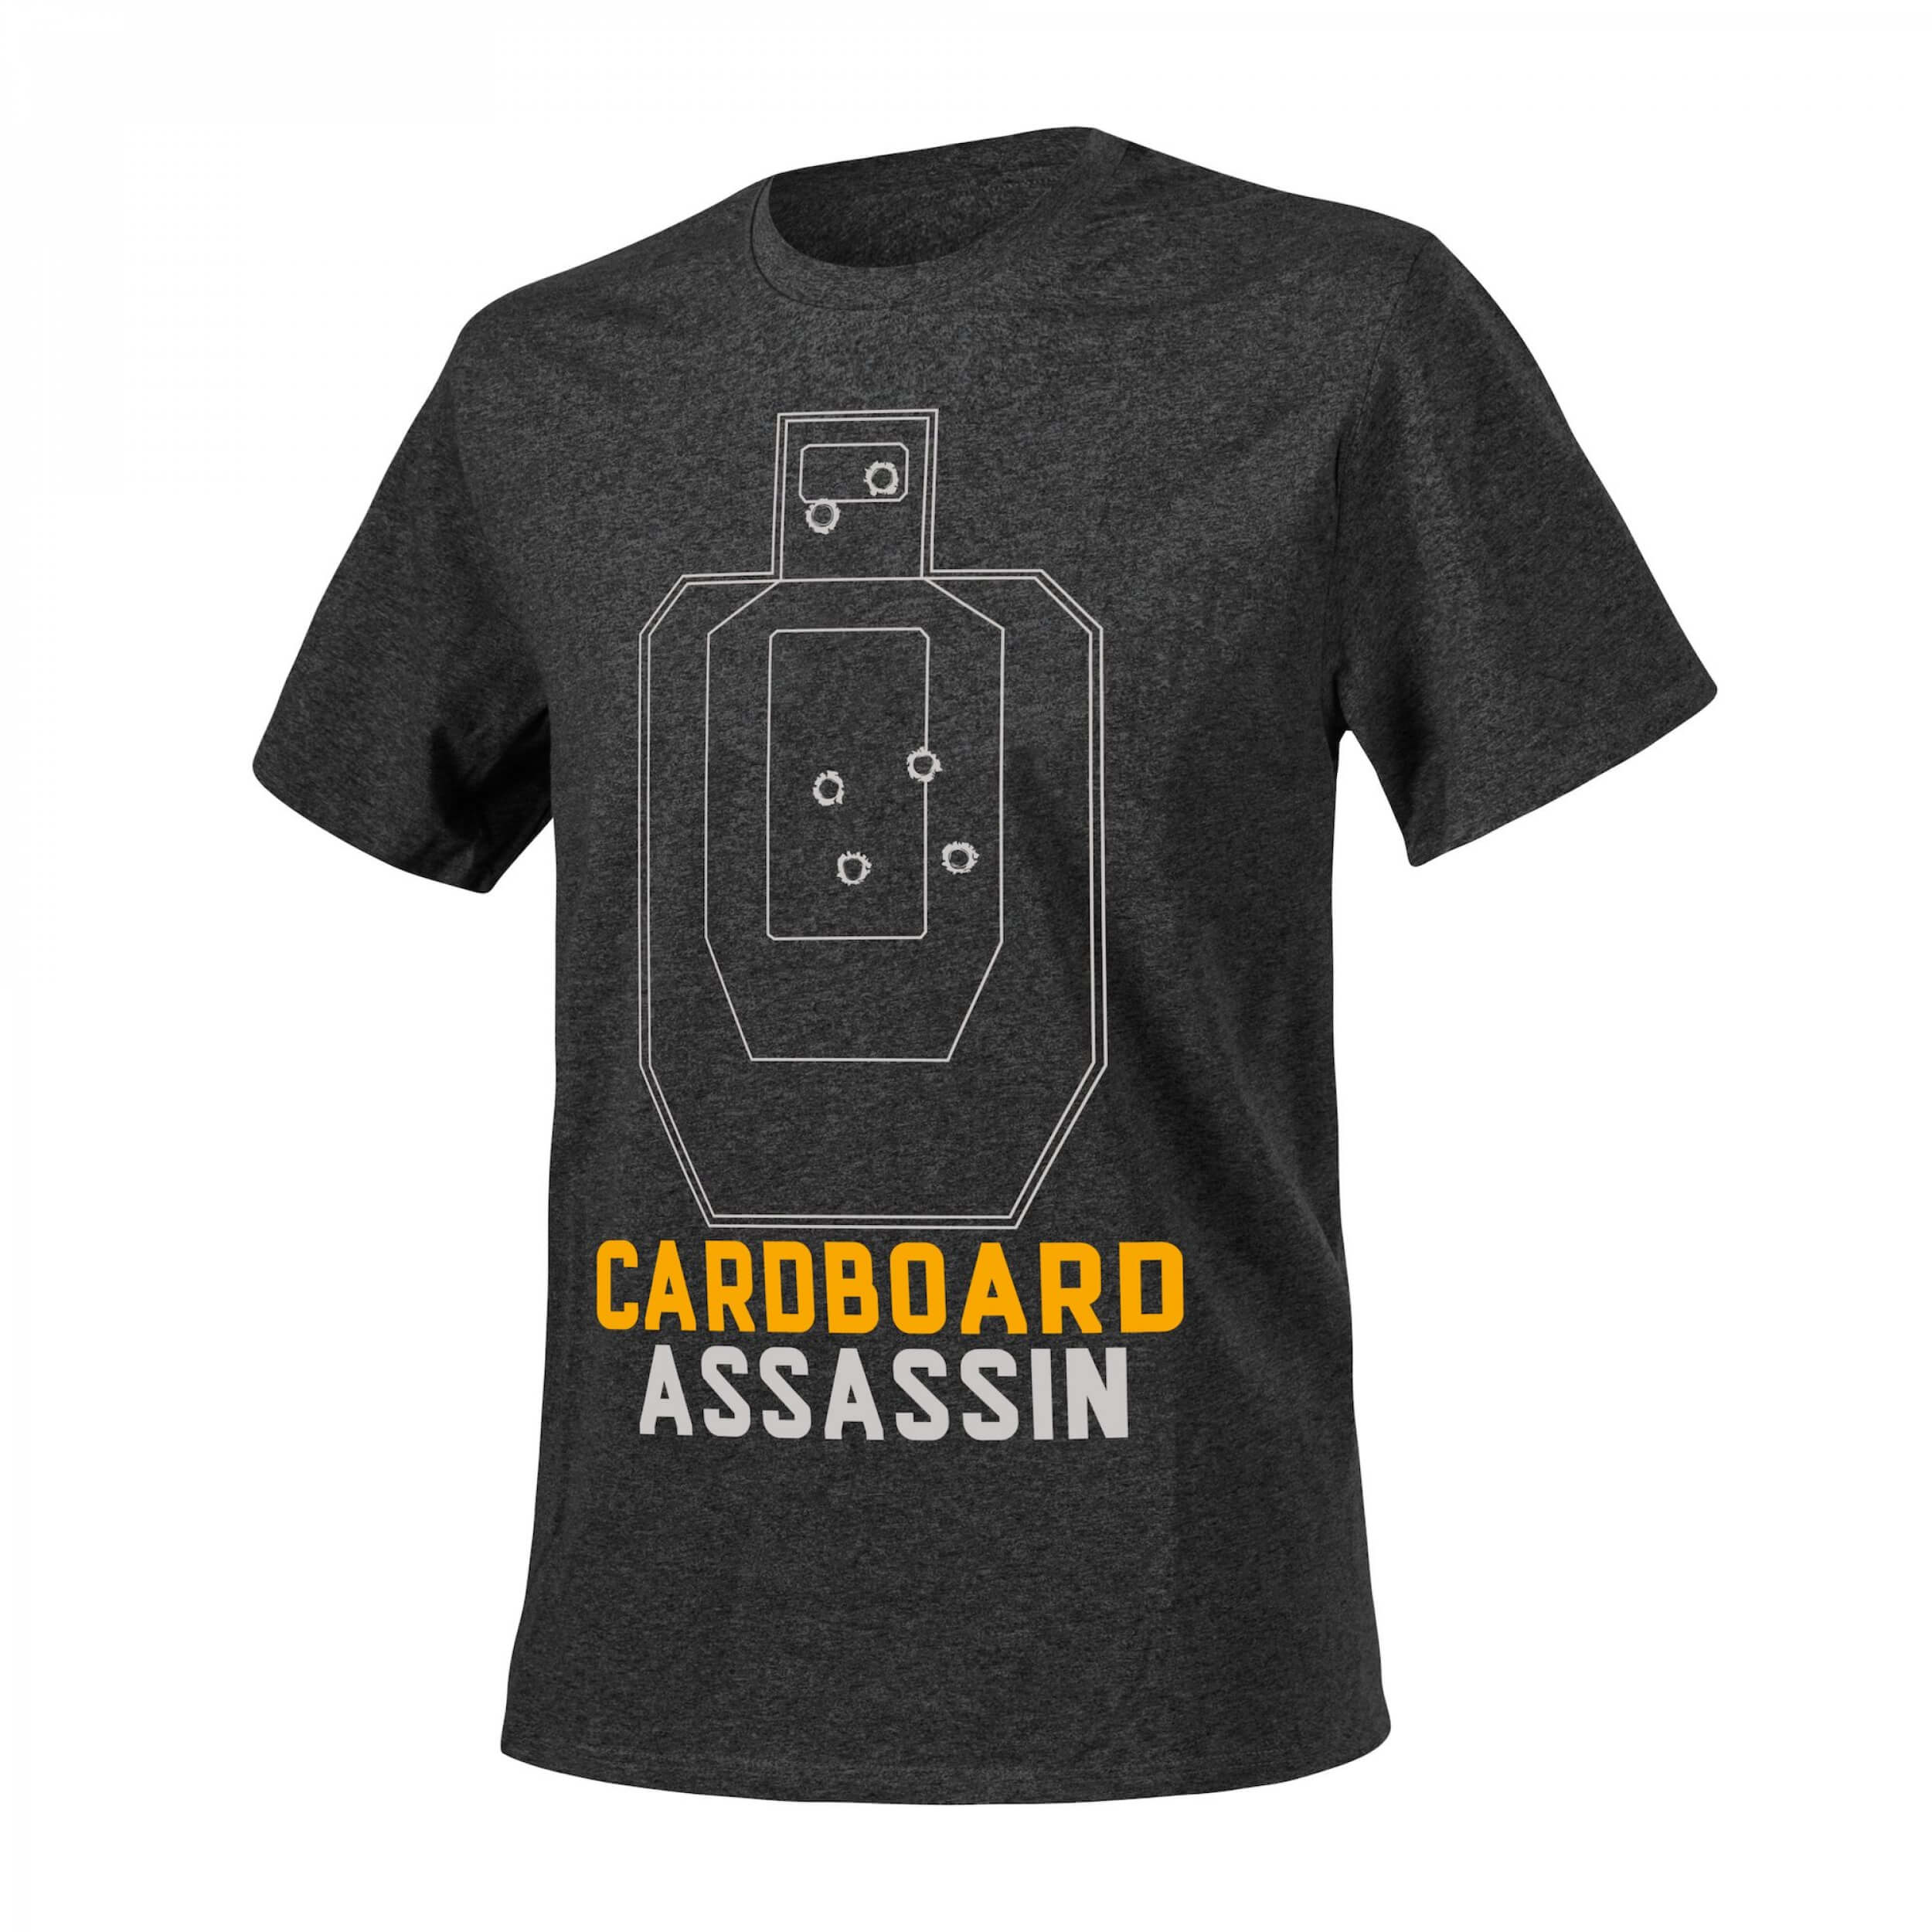 Helikon-Tex T-Shirt (Cardboard Assassin) -Cotton- Melange Black-Grey